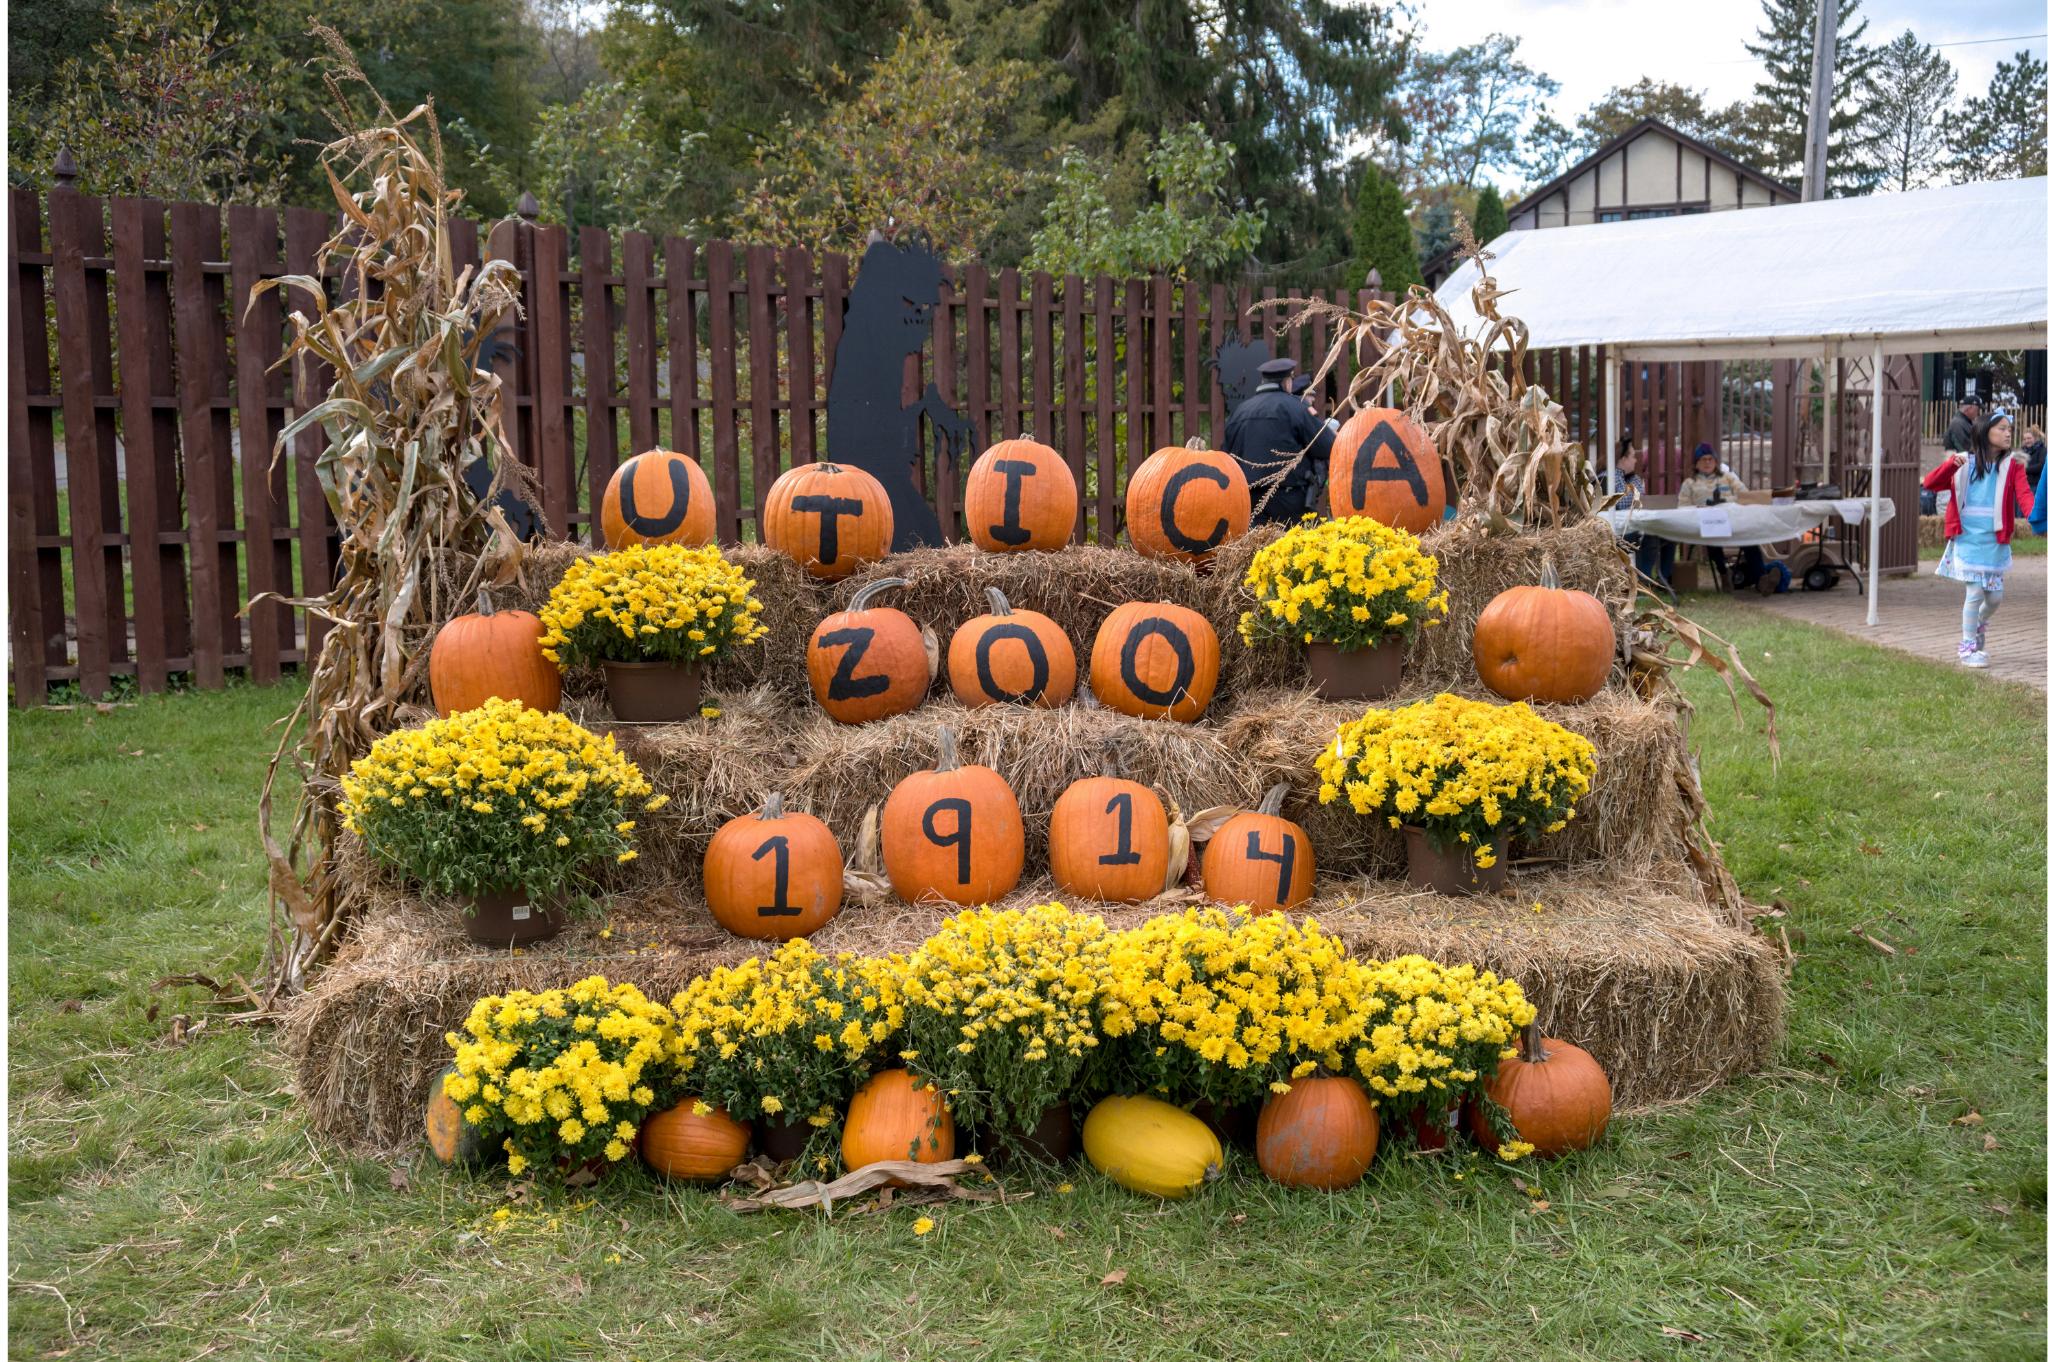 Spooktacular at Utica Zoo